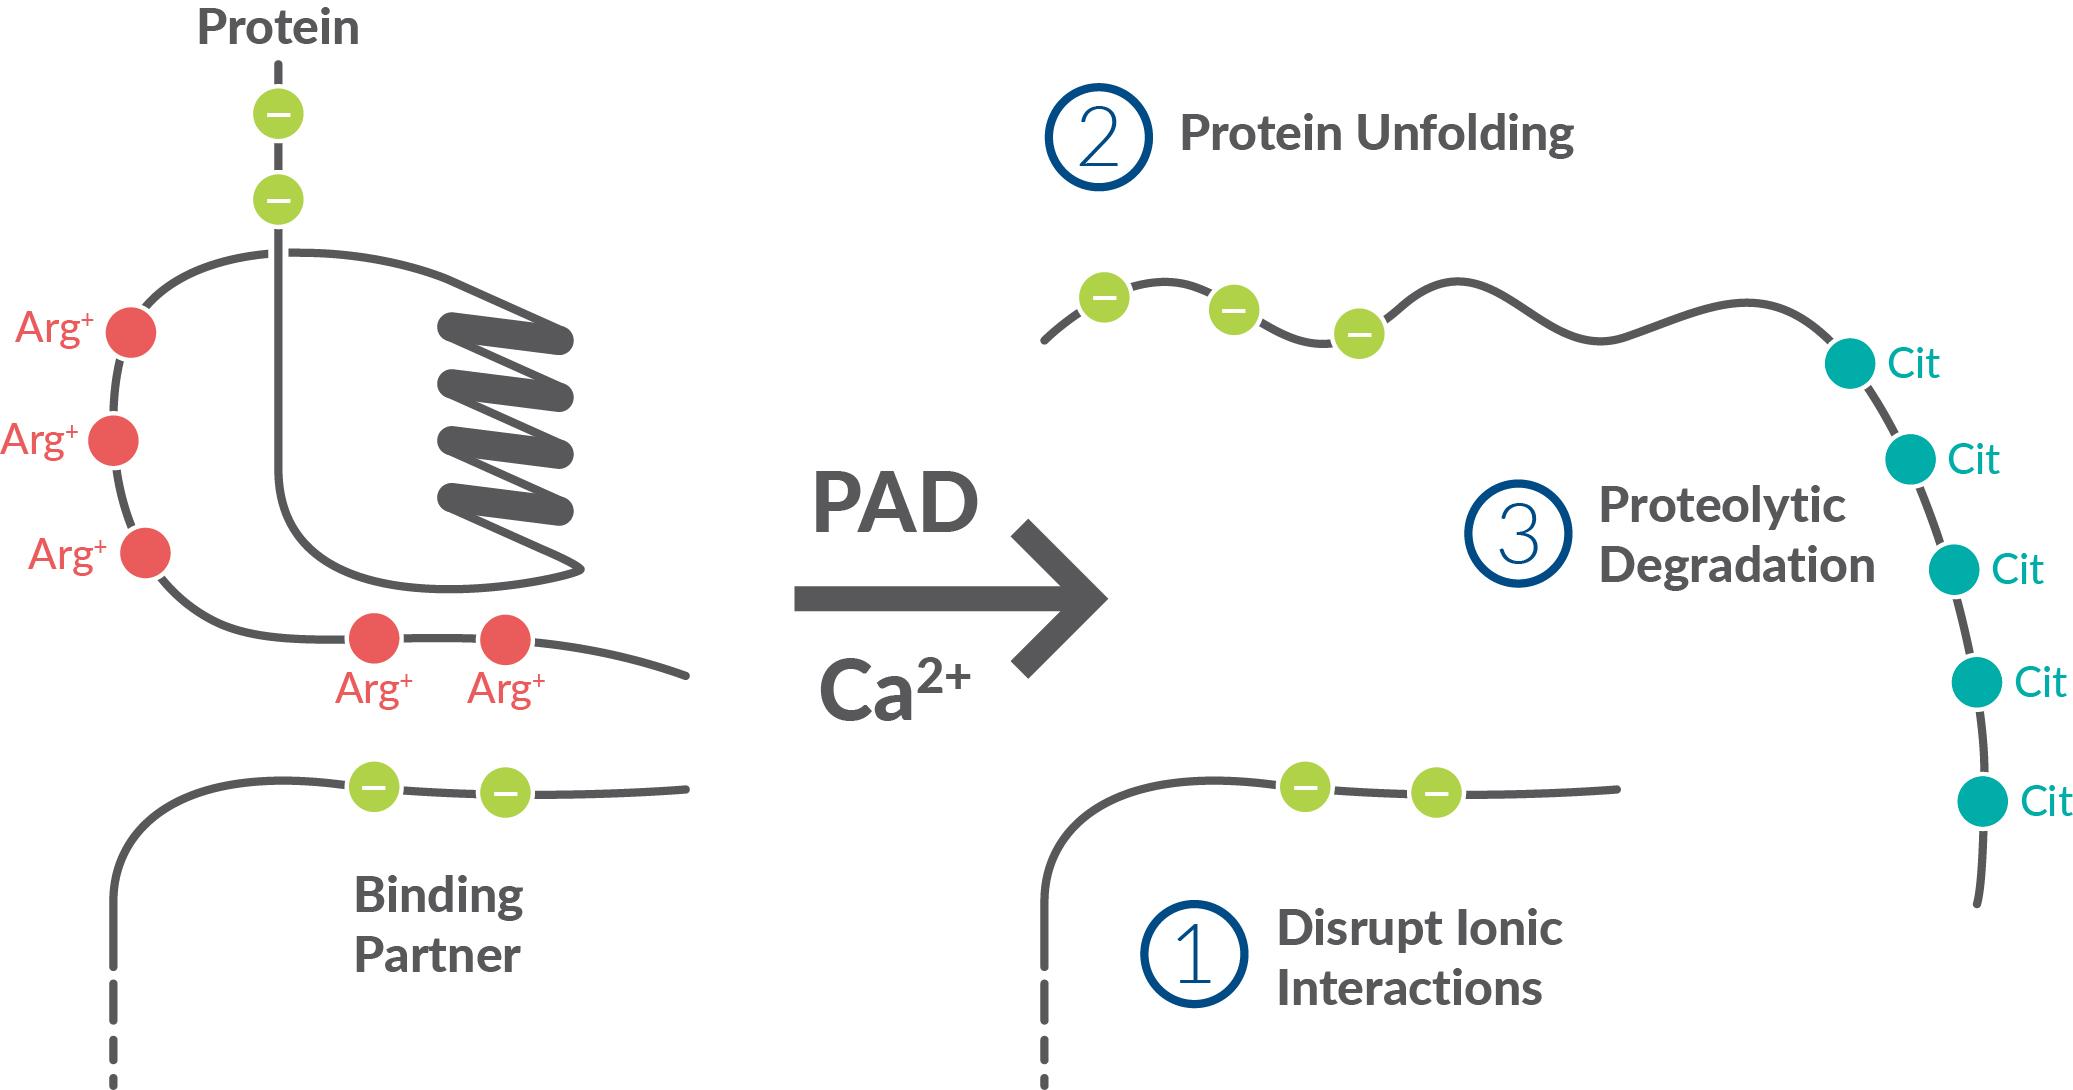 post translational modification through citrullination